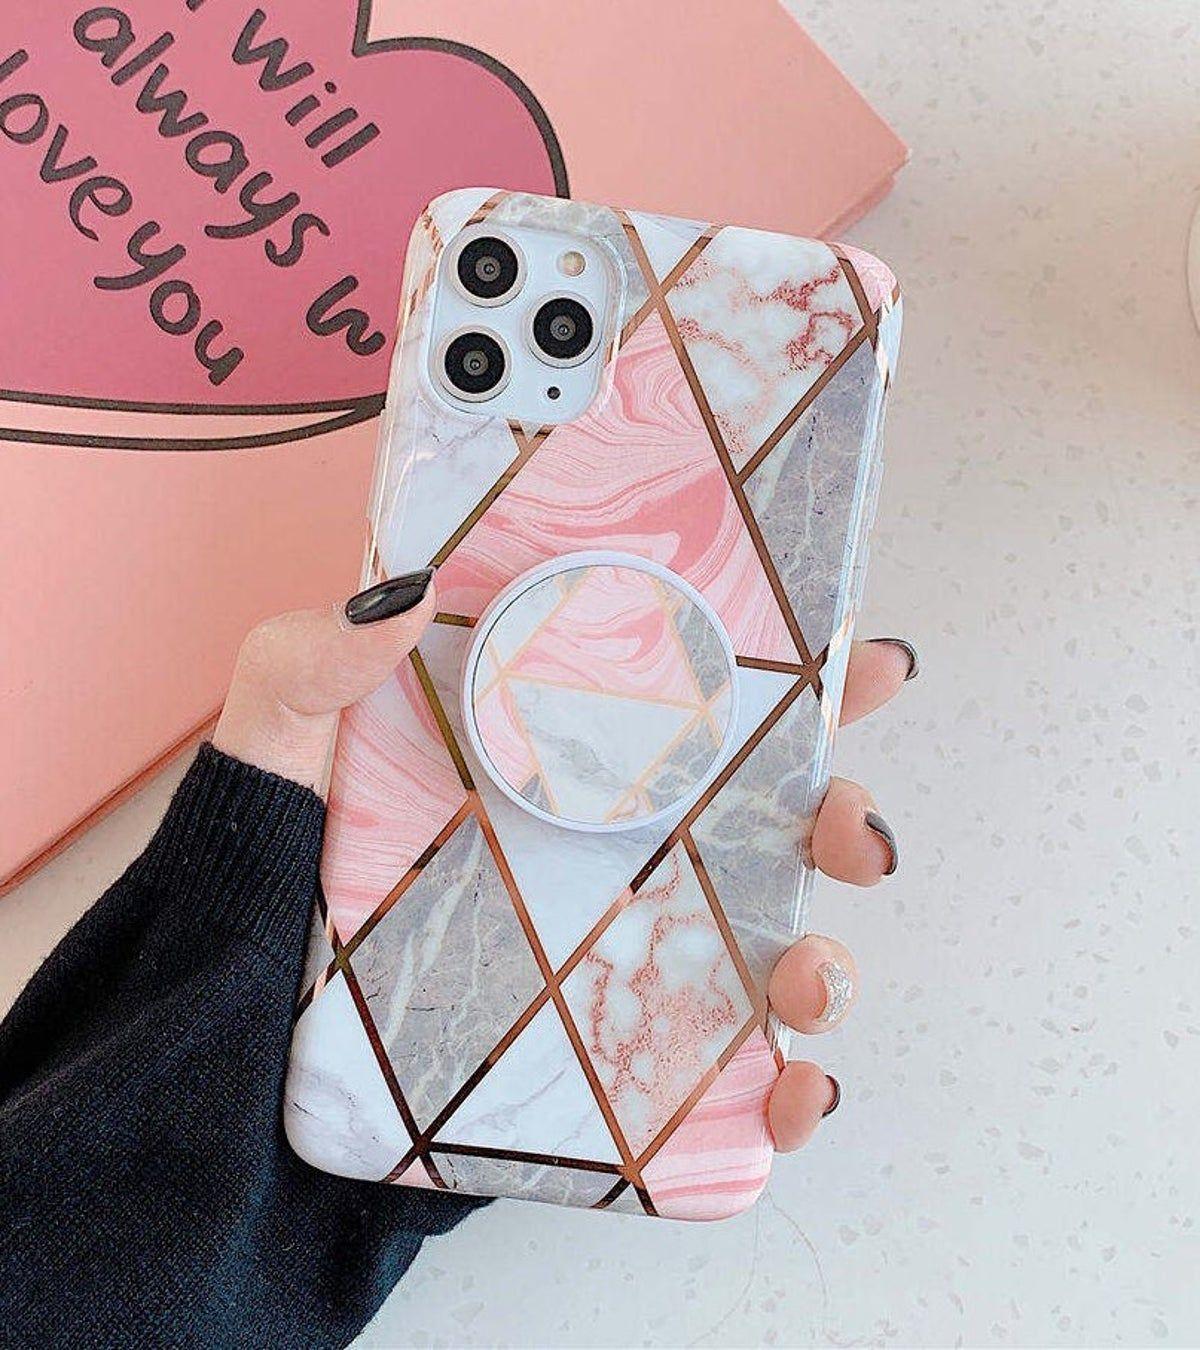 Iphone 11 Pro Max Case Geometric Marble In 2020 Pretty Iphone Cases Girly Phone Cases Apple Phone Case